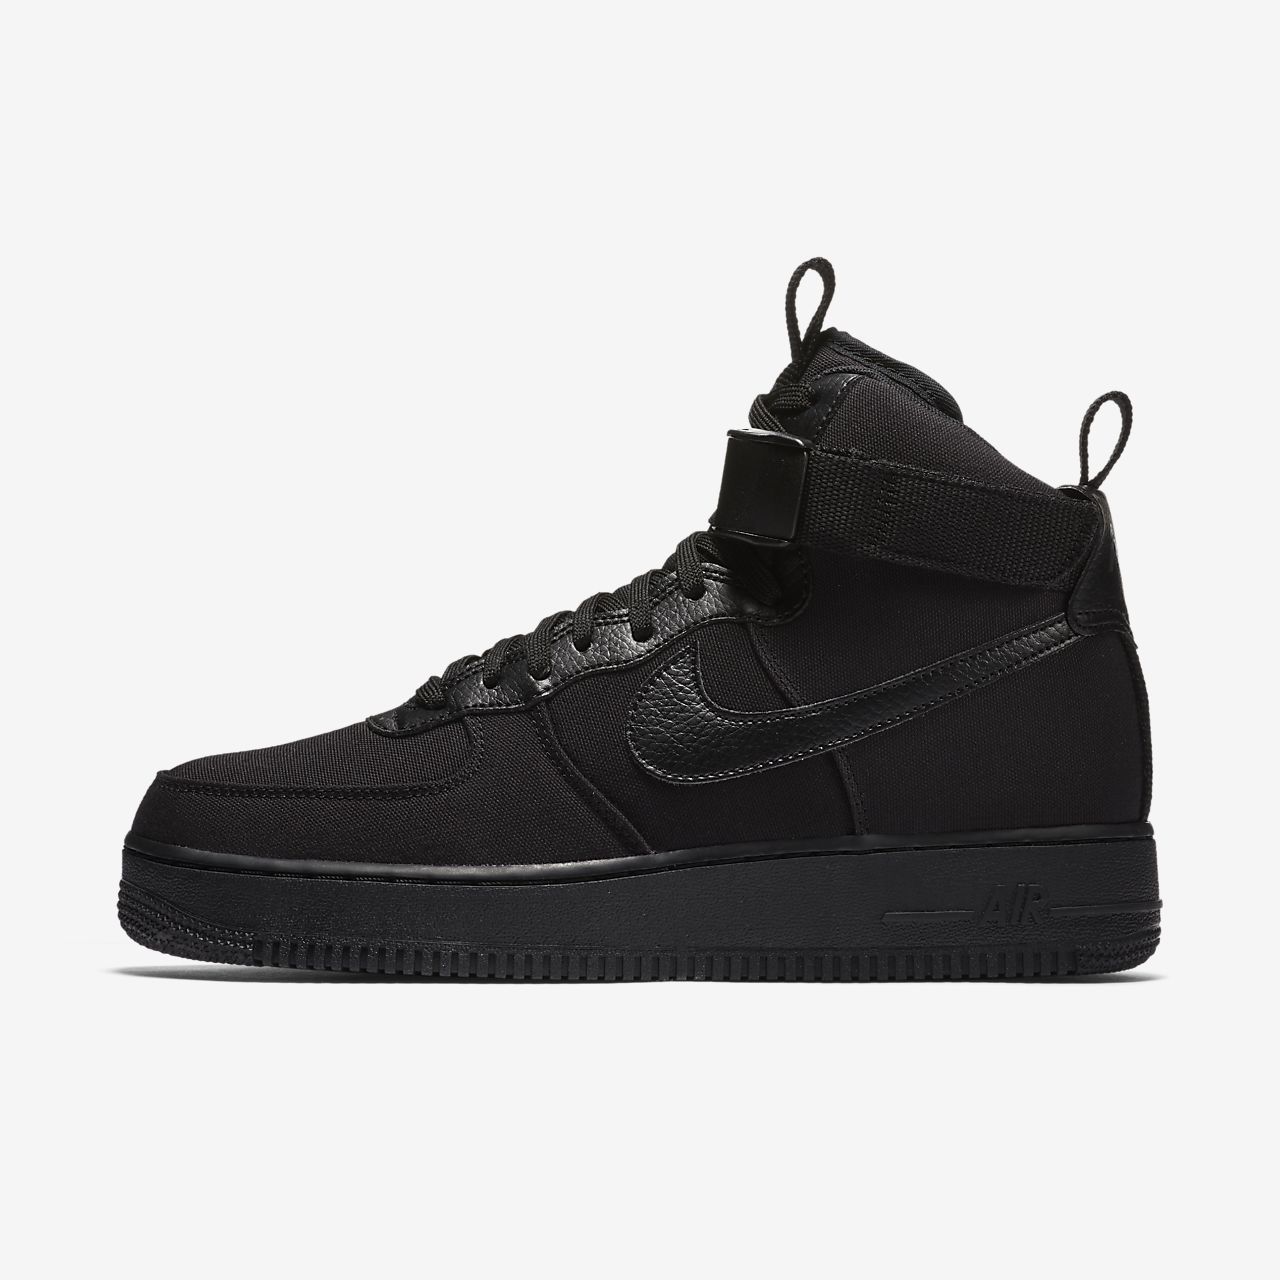 brand new dc3b7 8323e Nike Air Force 1 Anthracite Black